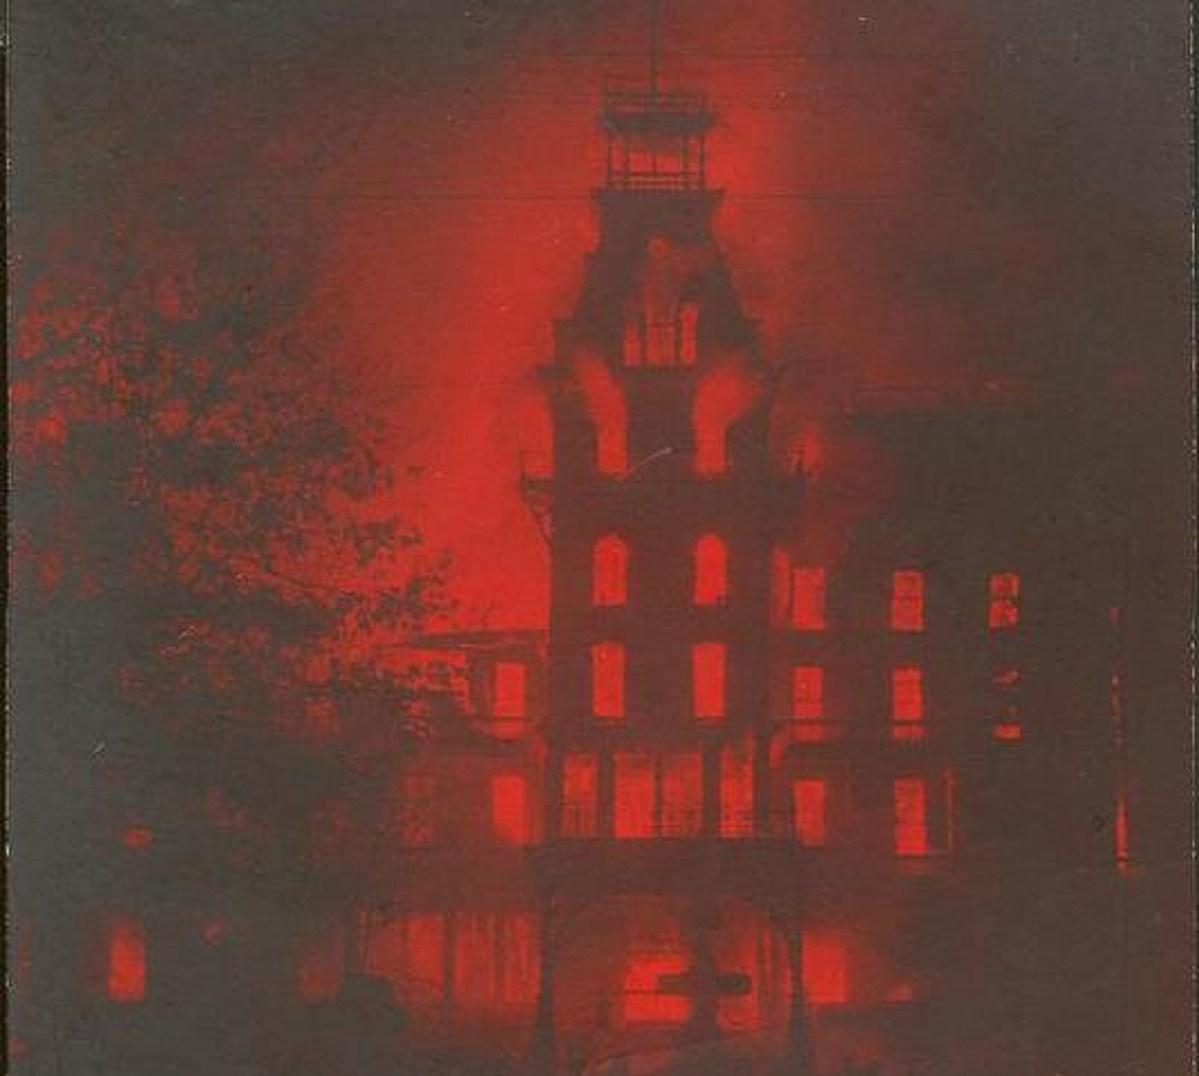 Battle Creek's Biggest Fire Happened February 18th, 1902